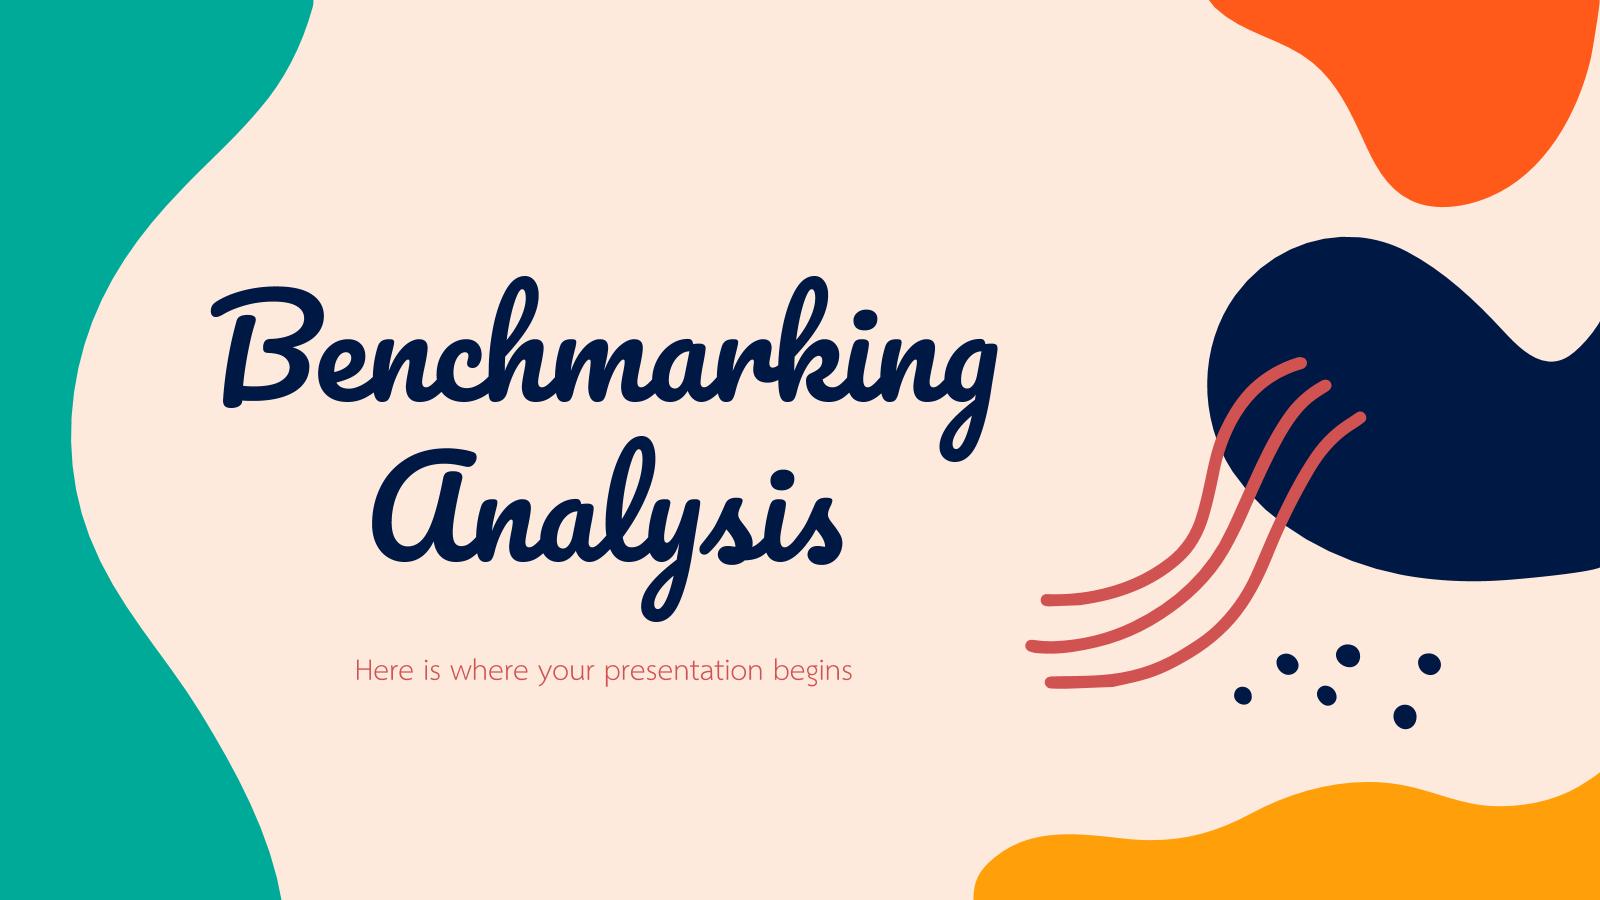 Benchmarking Analysis presentation template